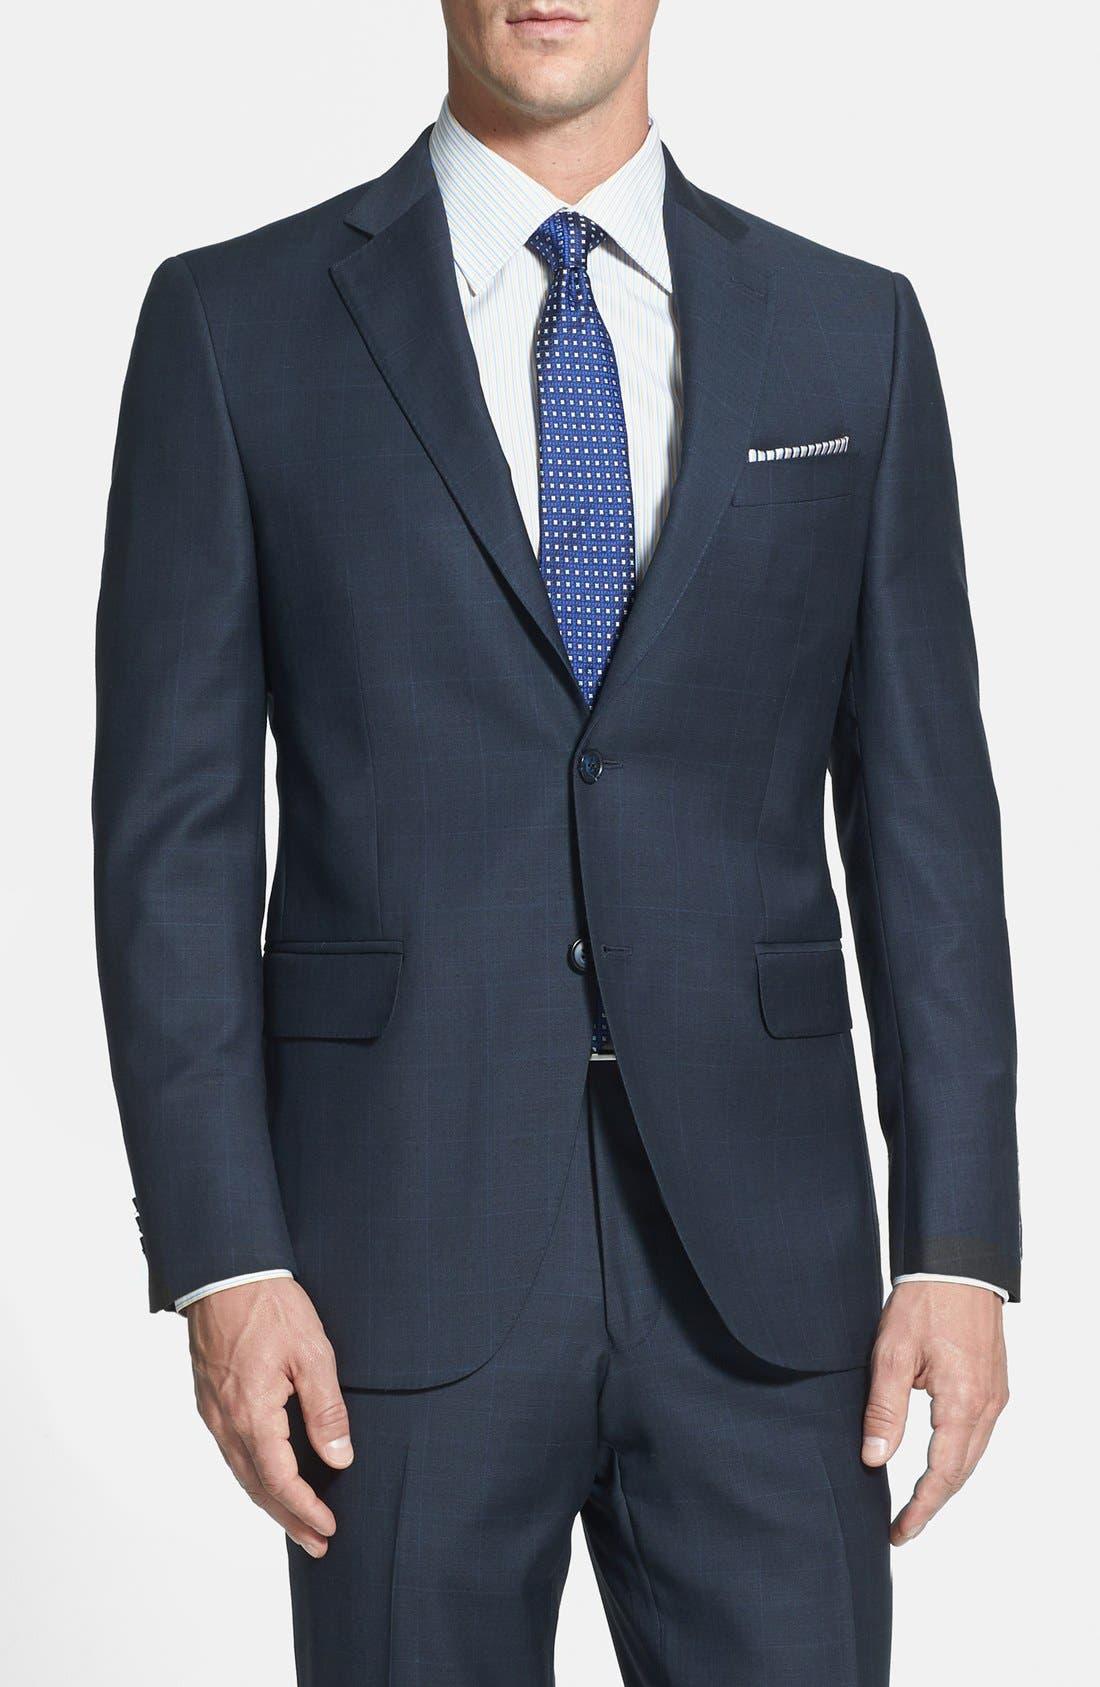 PETER MILLAR,                             Classic Fit Navy Windowpane Suit,                             Alternate thumbnail 2, color,                             410